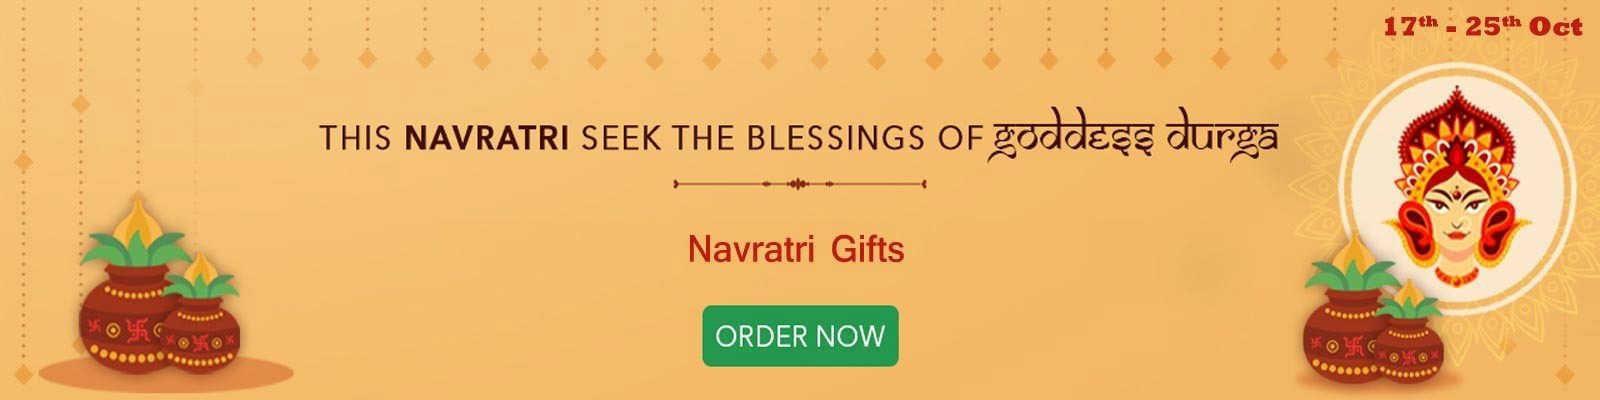 Navratri Gifts